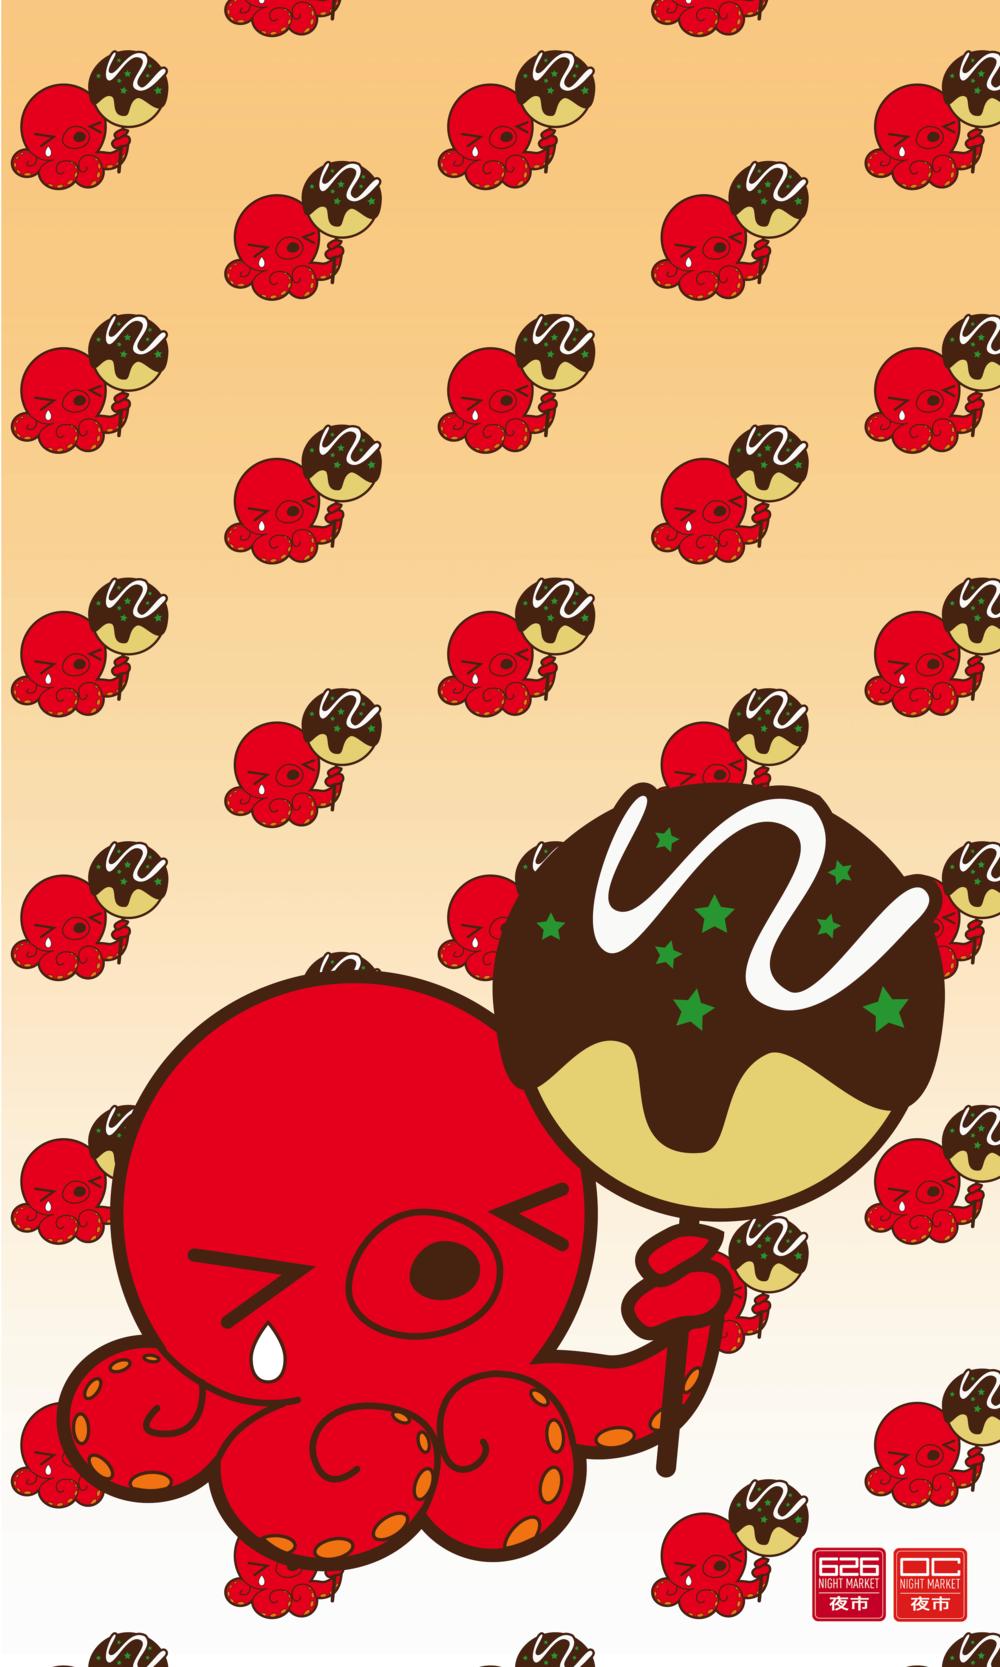 oc-night-market-takoyaki-phone-wallpaper.png